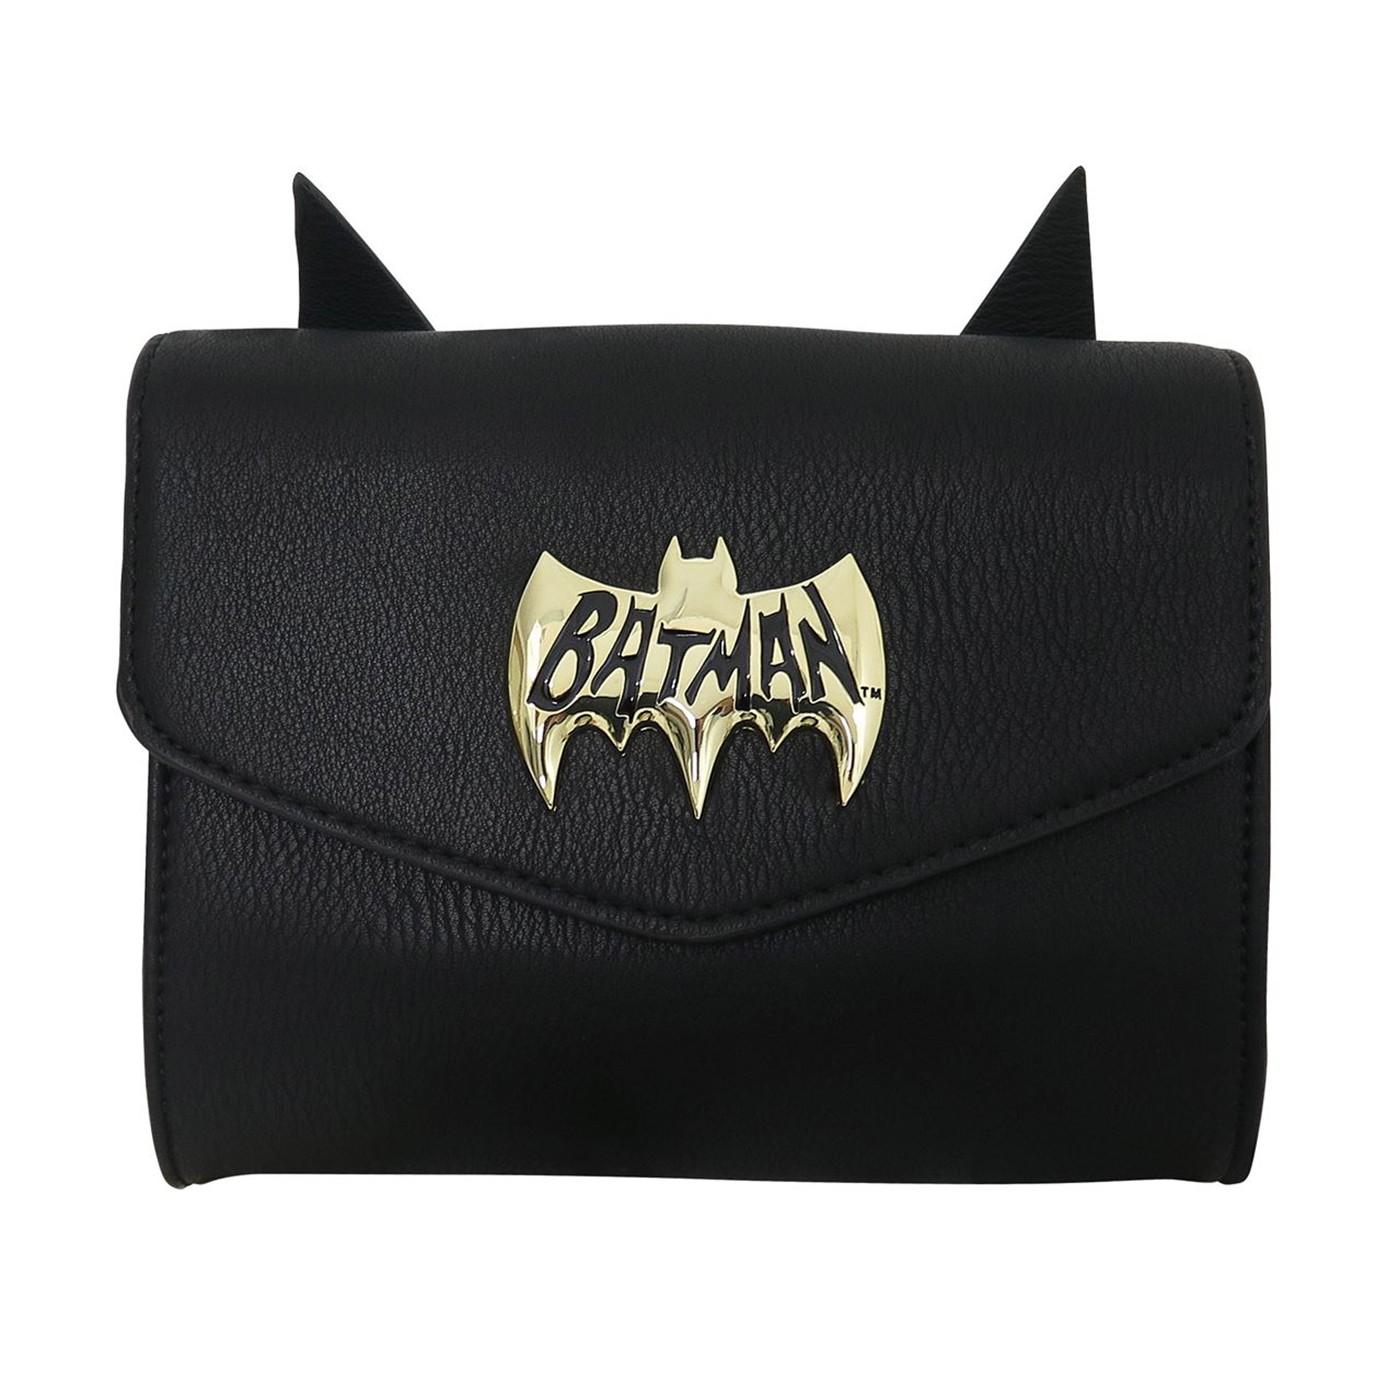 Adam West Batman Sidekick Cross-Body Bag